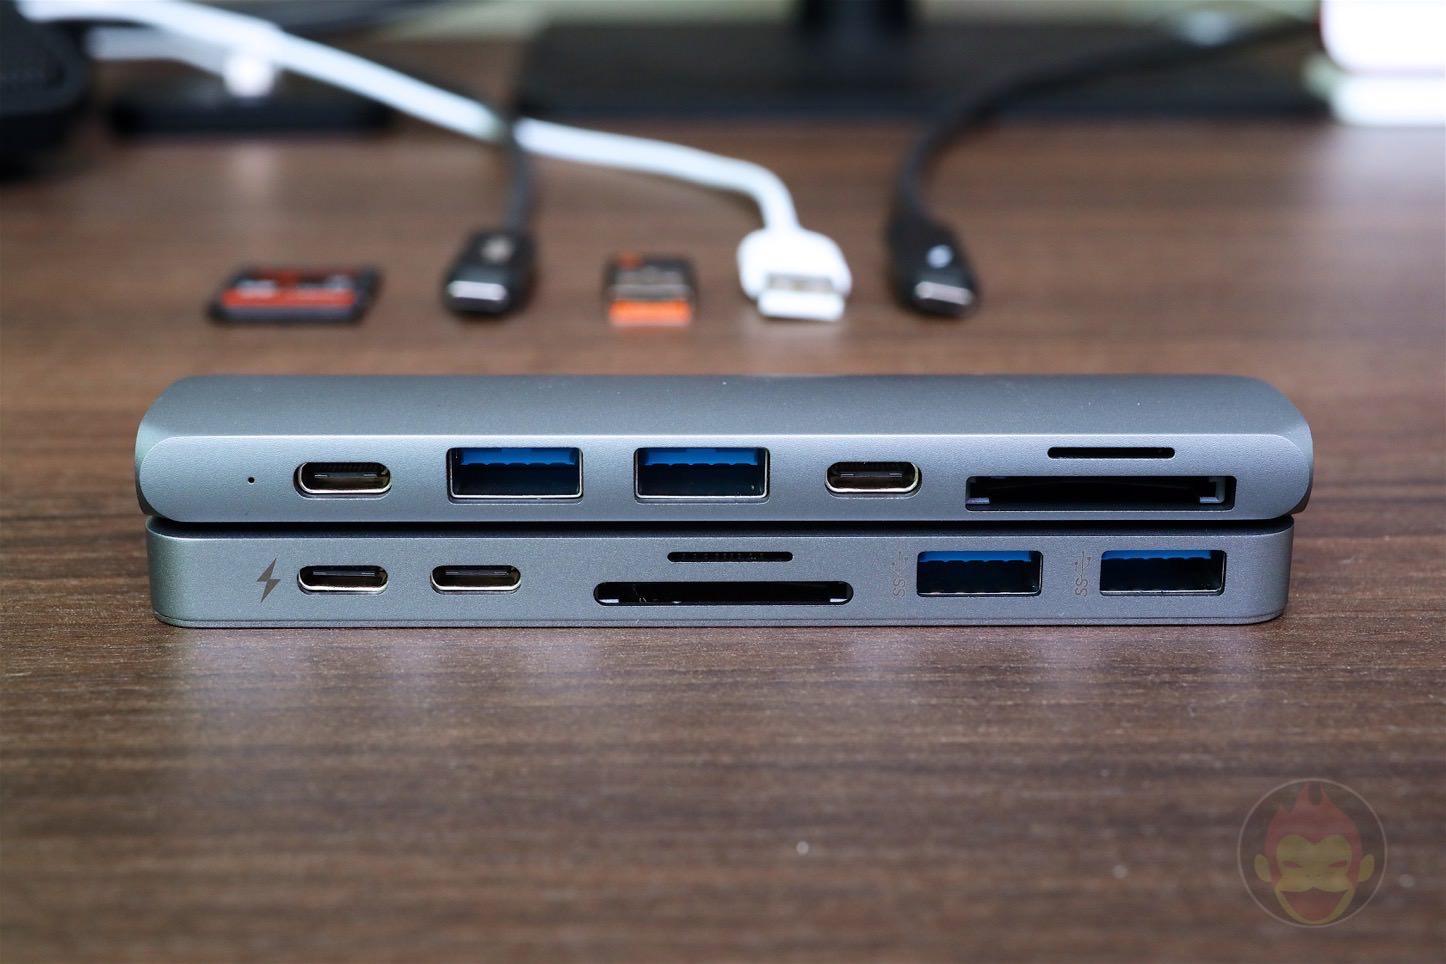 Satechi-TypeC-Pro-Hub-VS-HyperDrive-USBC-Hub-10.jpg